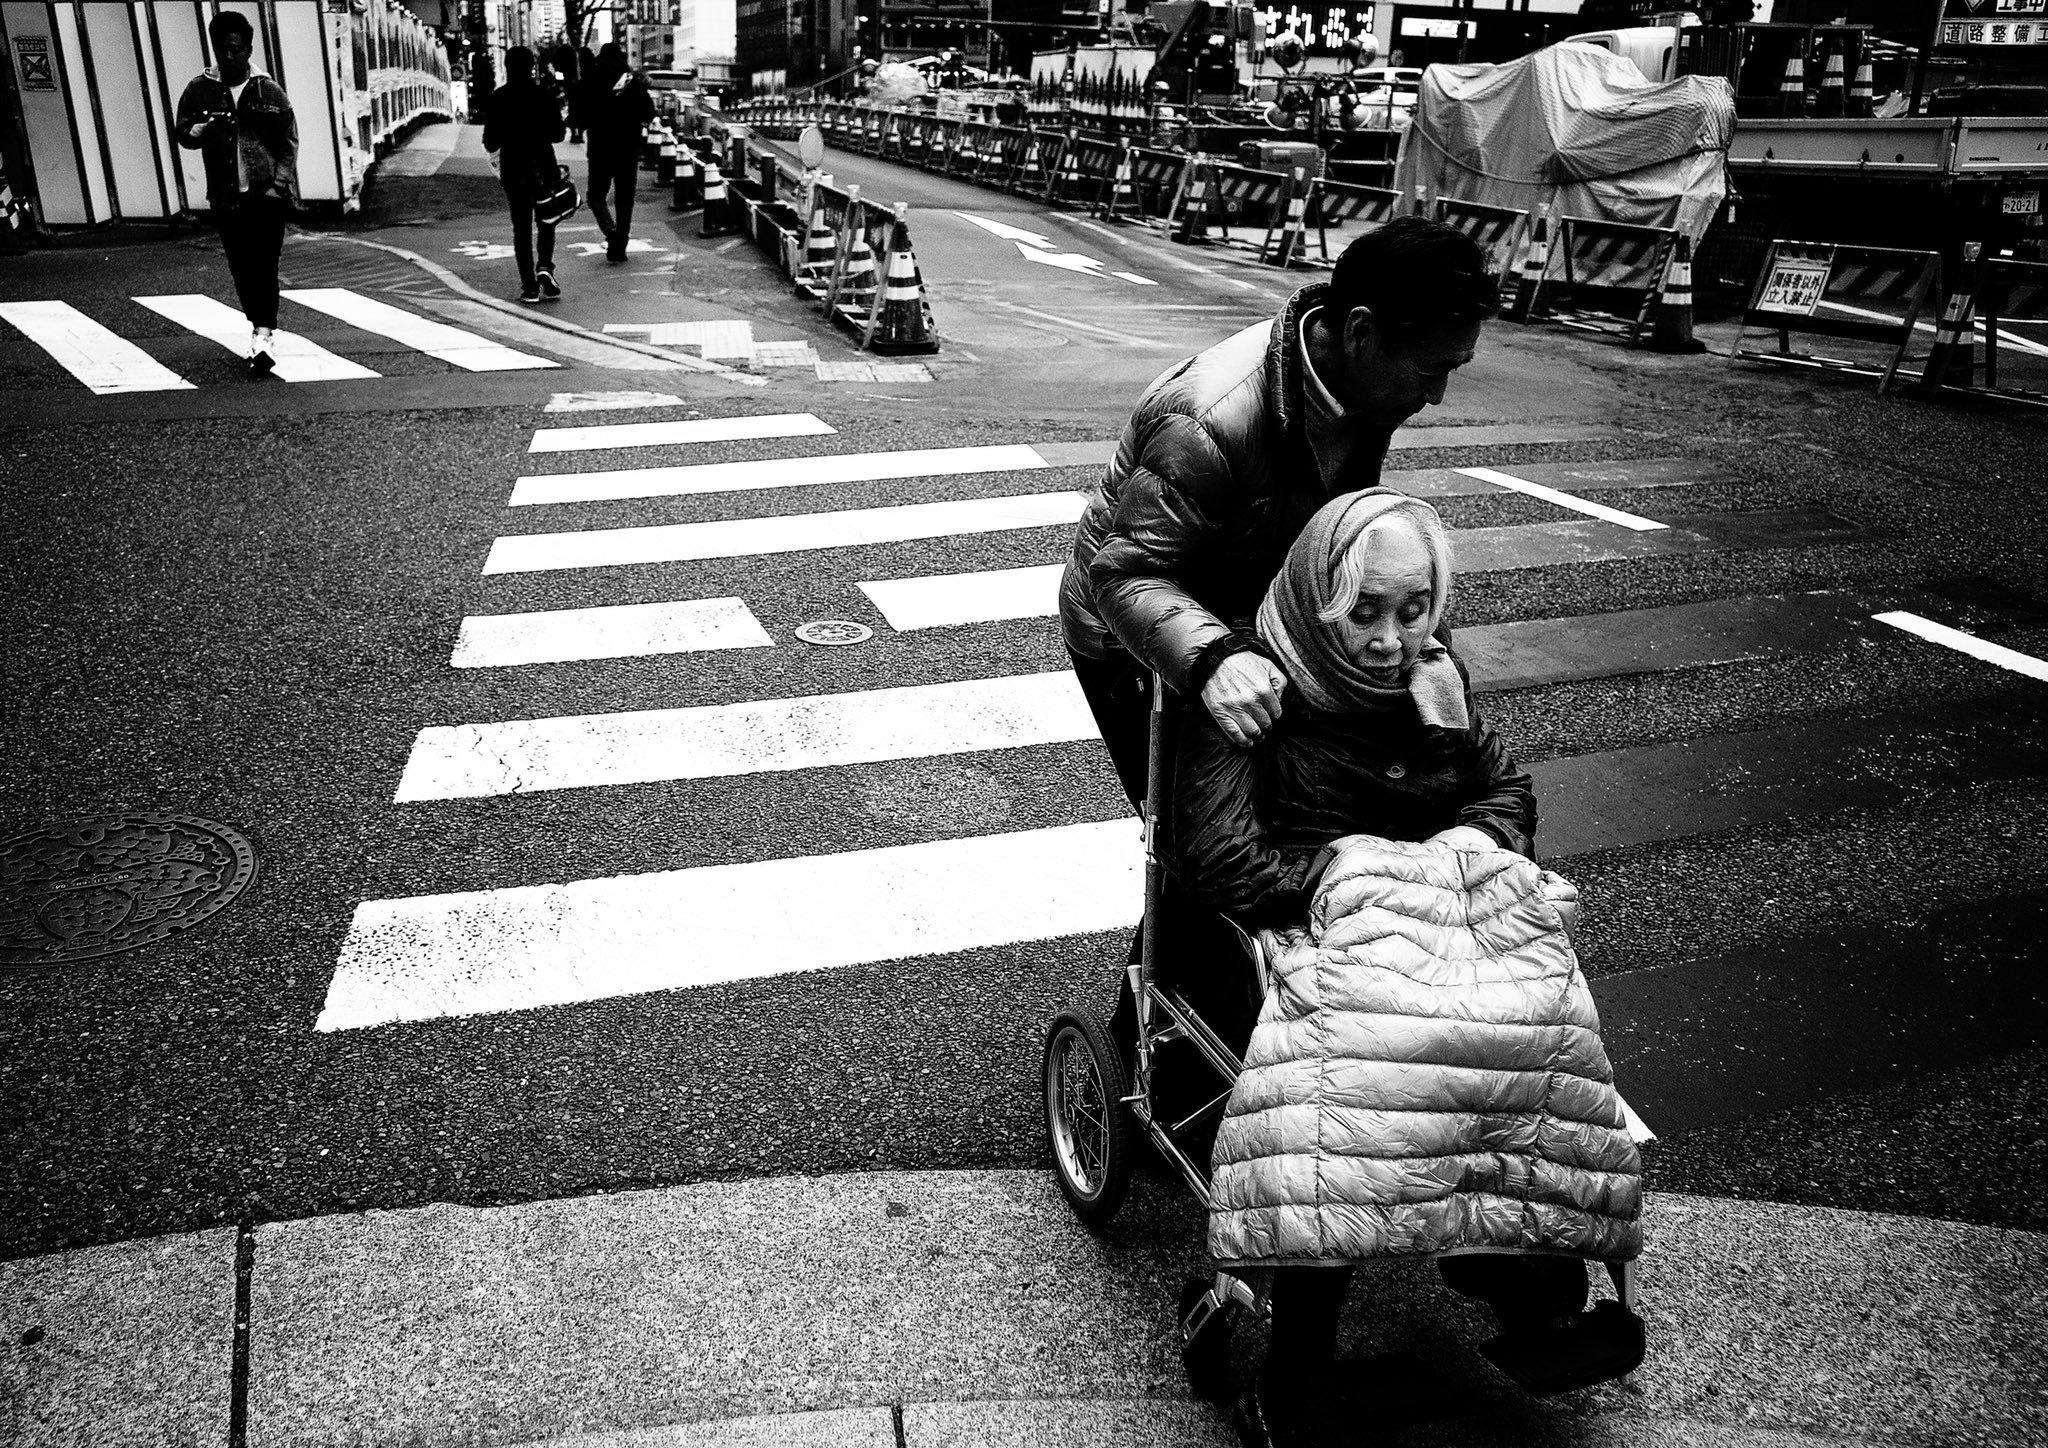 black_and_white_street_photography_11.jpg